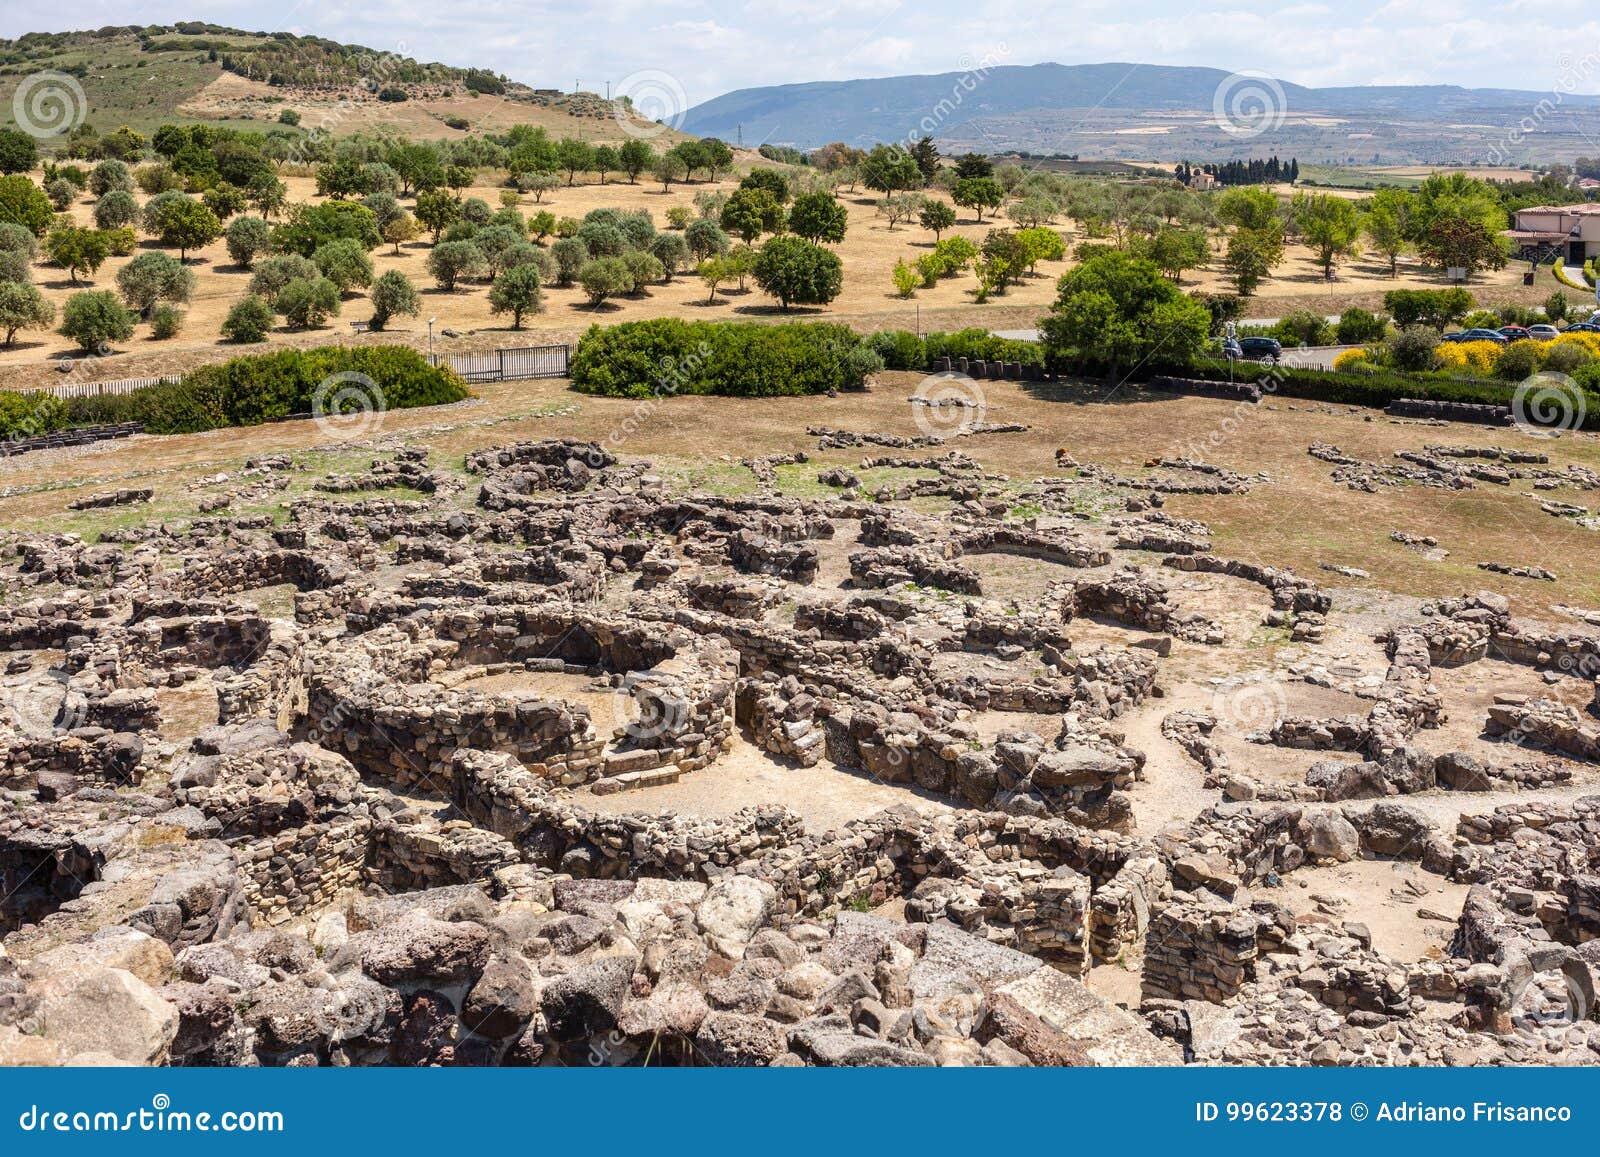 Nuragic ruins of the archaeological site of Barumini in Sardinia